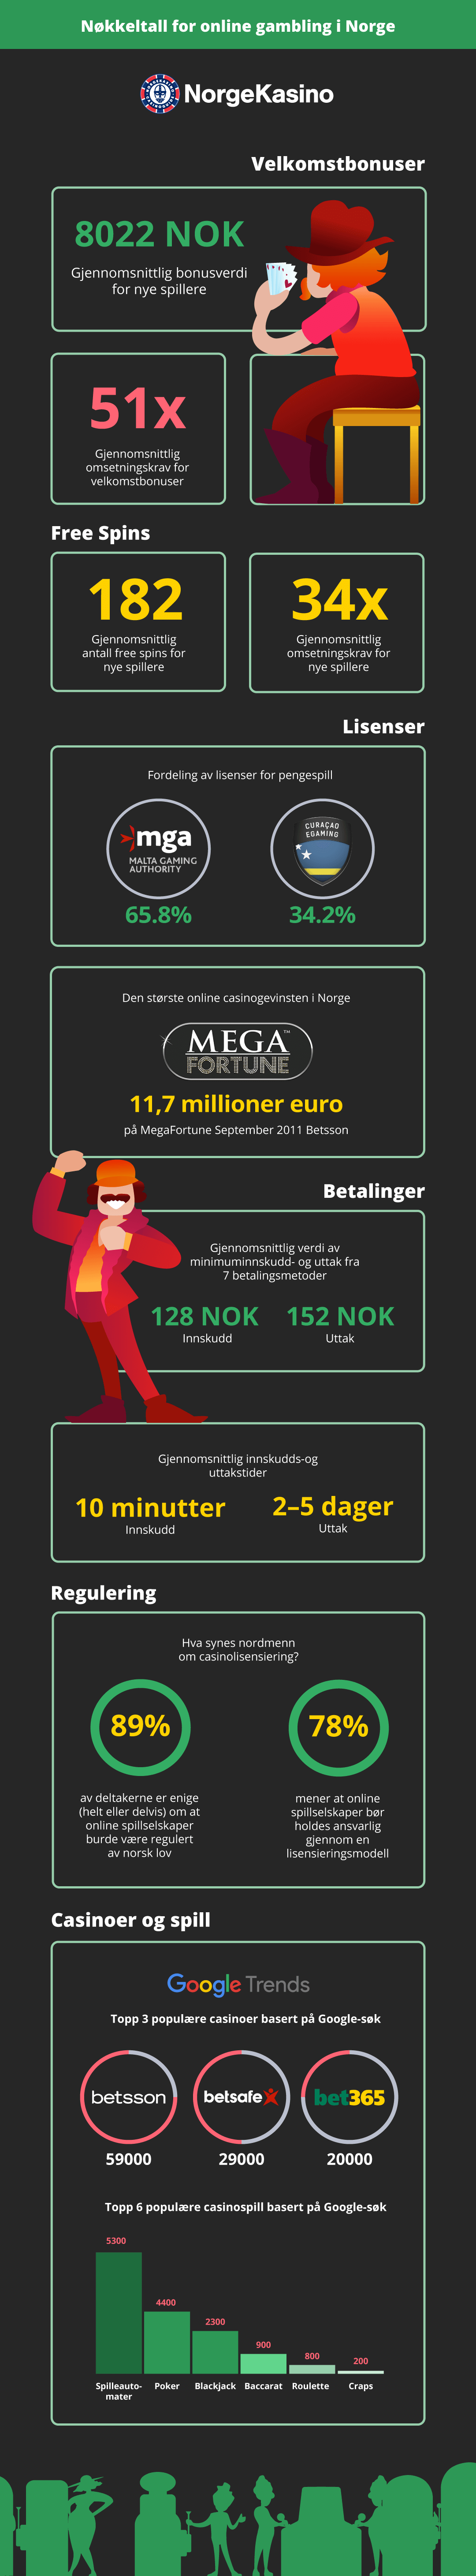 Fakta om casino i Norge - infografikk